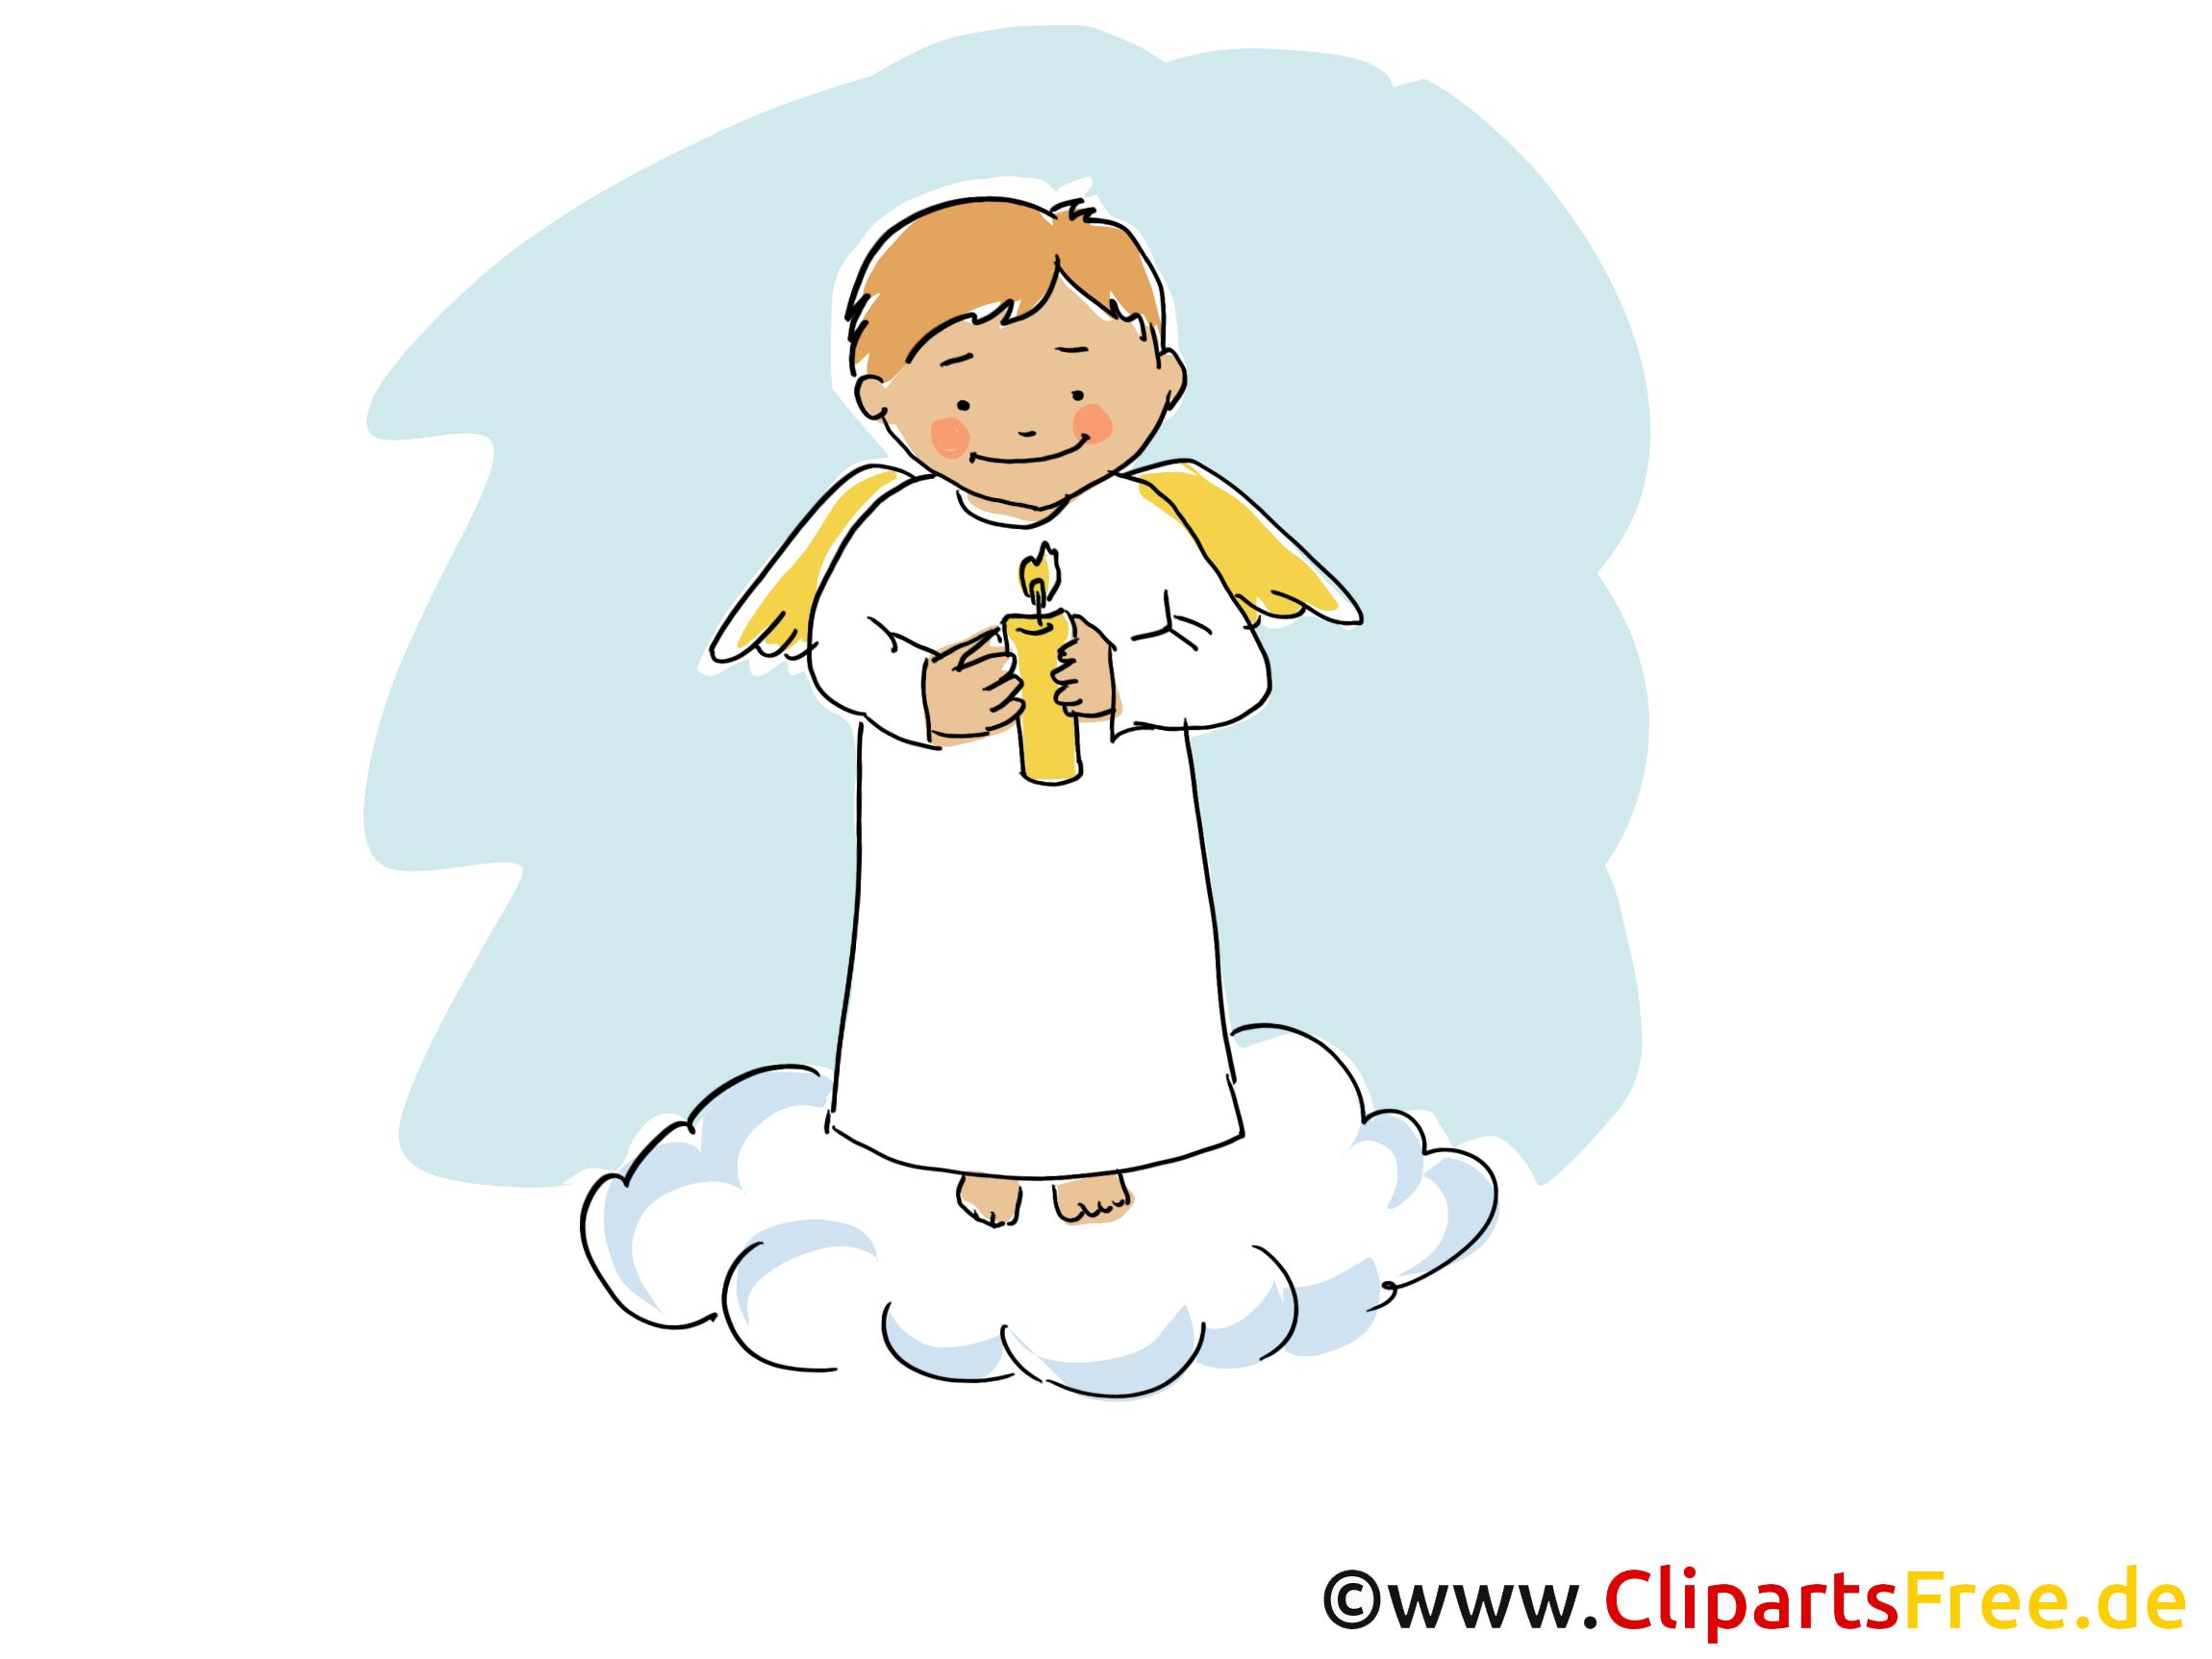 Bien connu Ange clip arts gratuits - Baptême illustrations - Baptême dessin  GI07